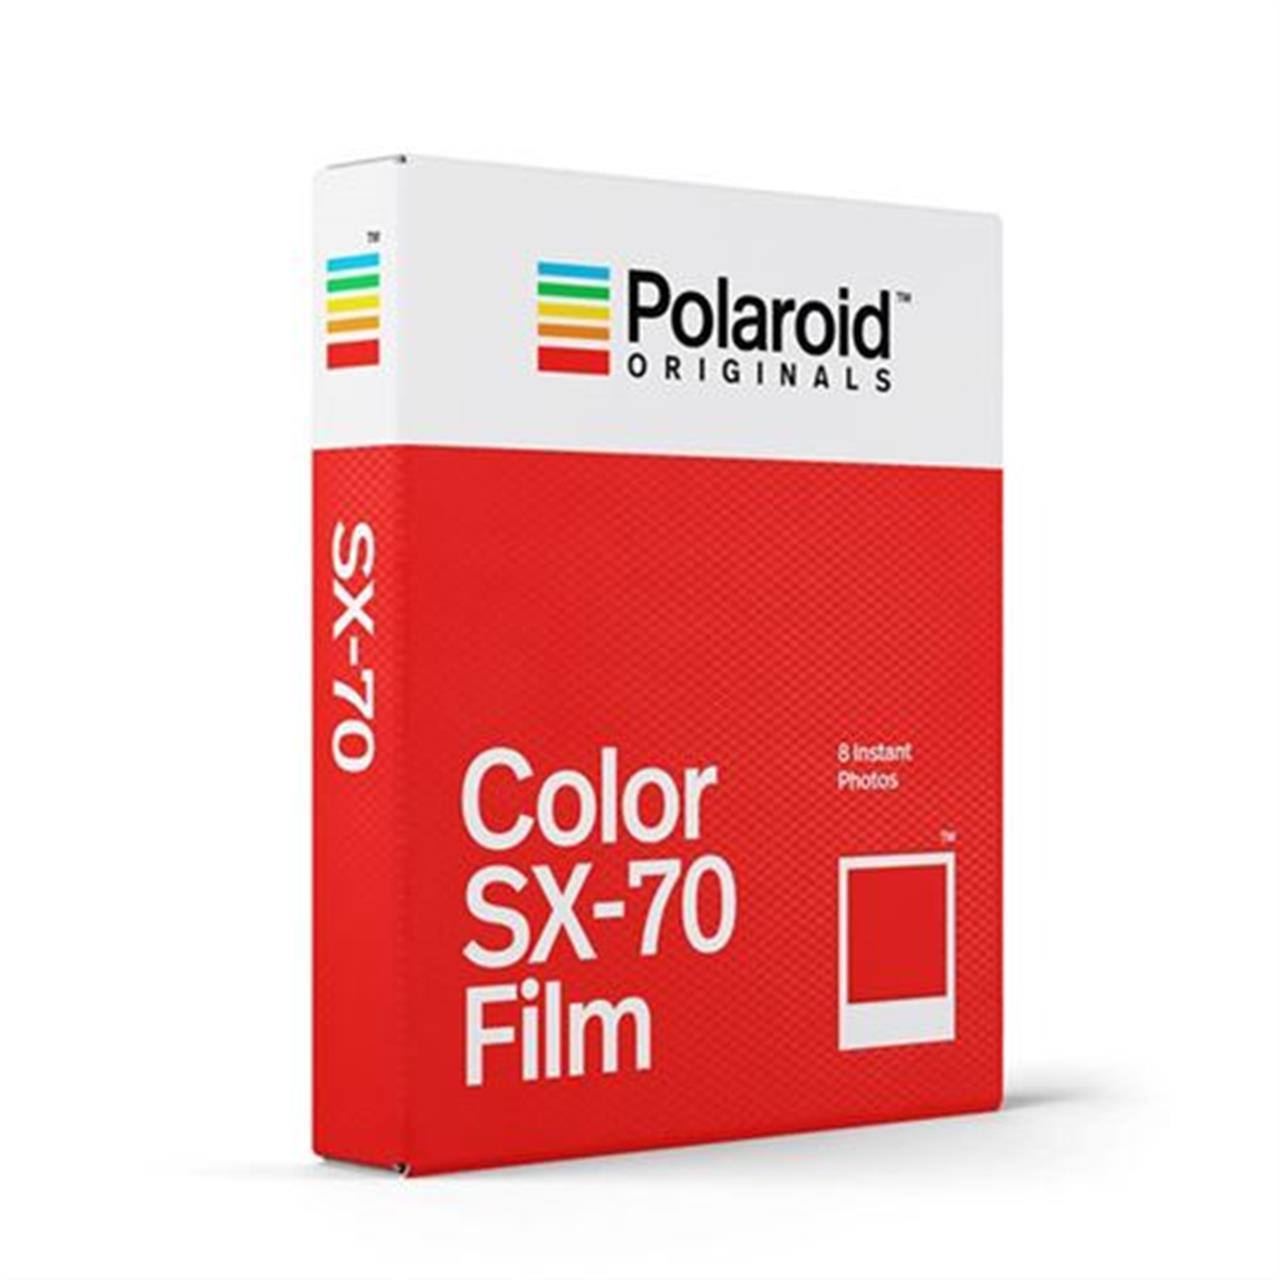 9120066087799__polaroid_color_sx70_film.jpg